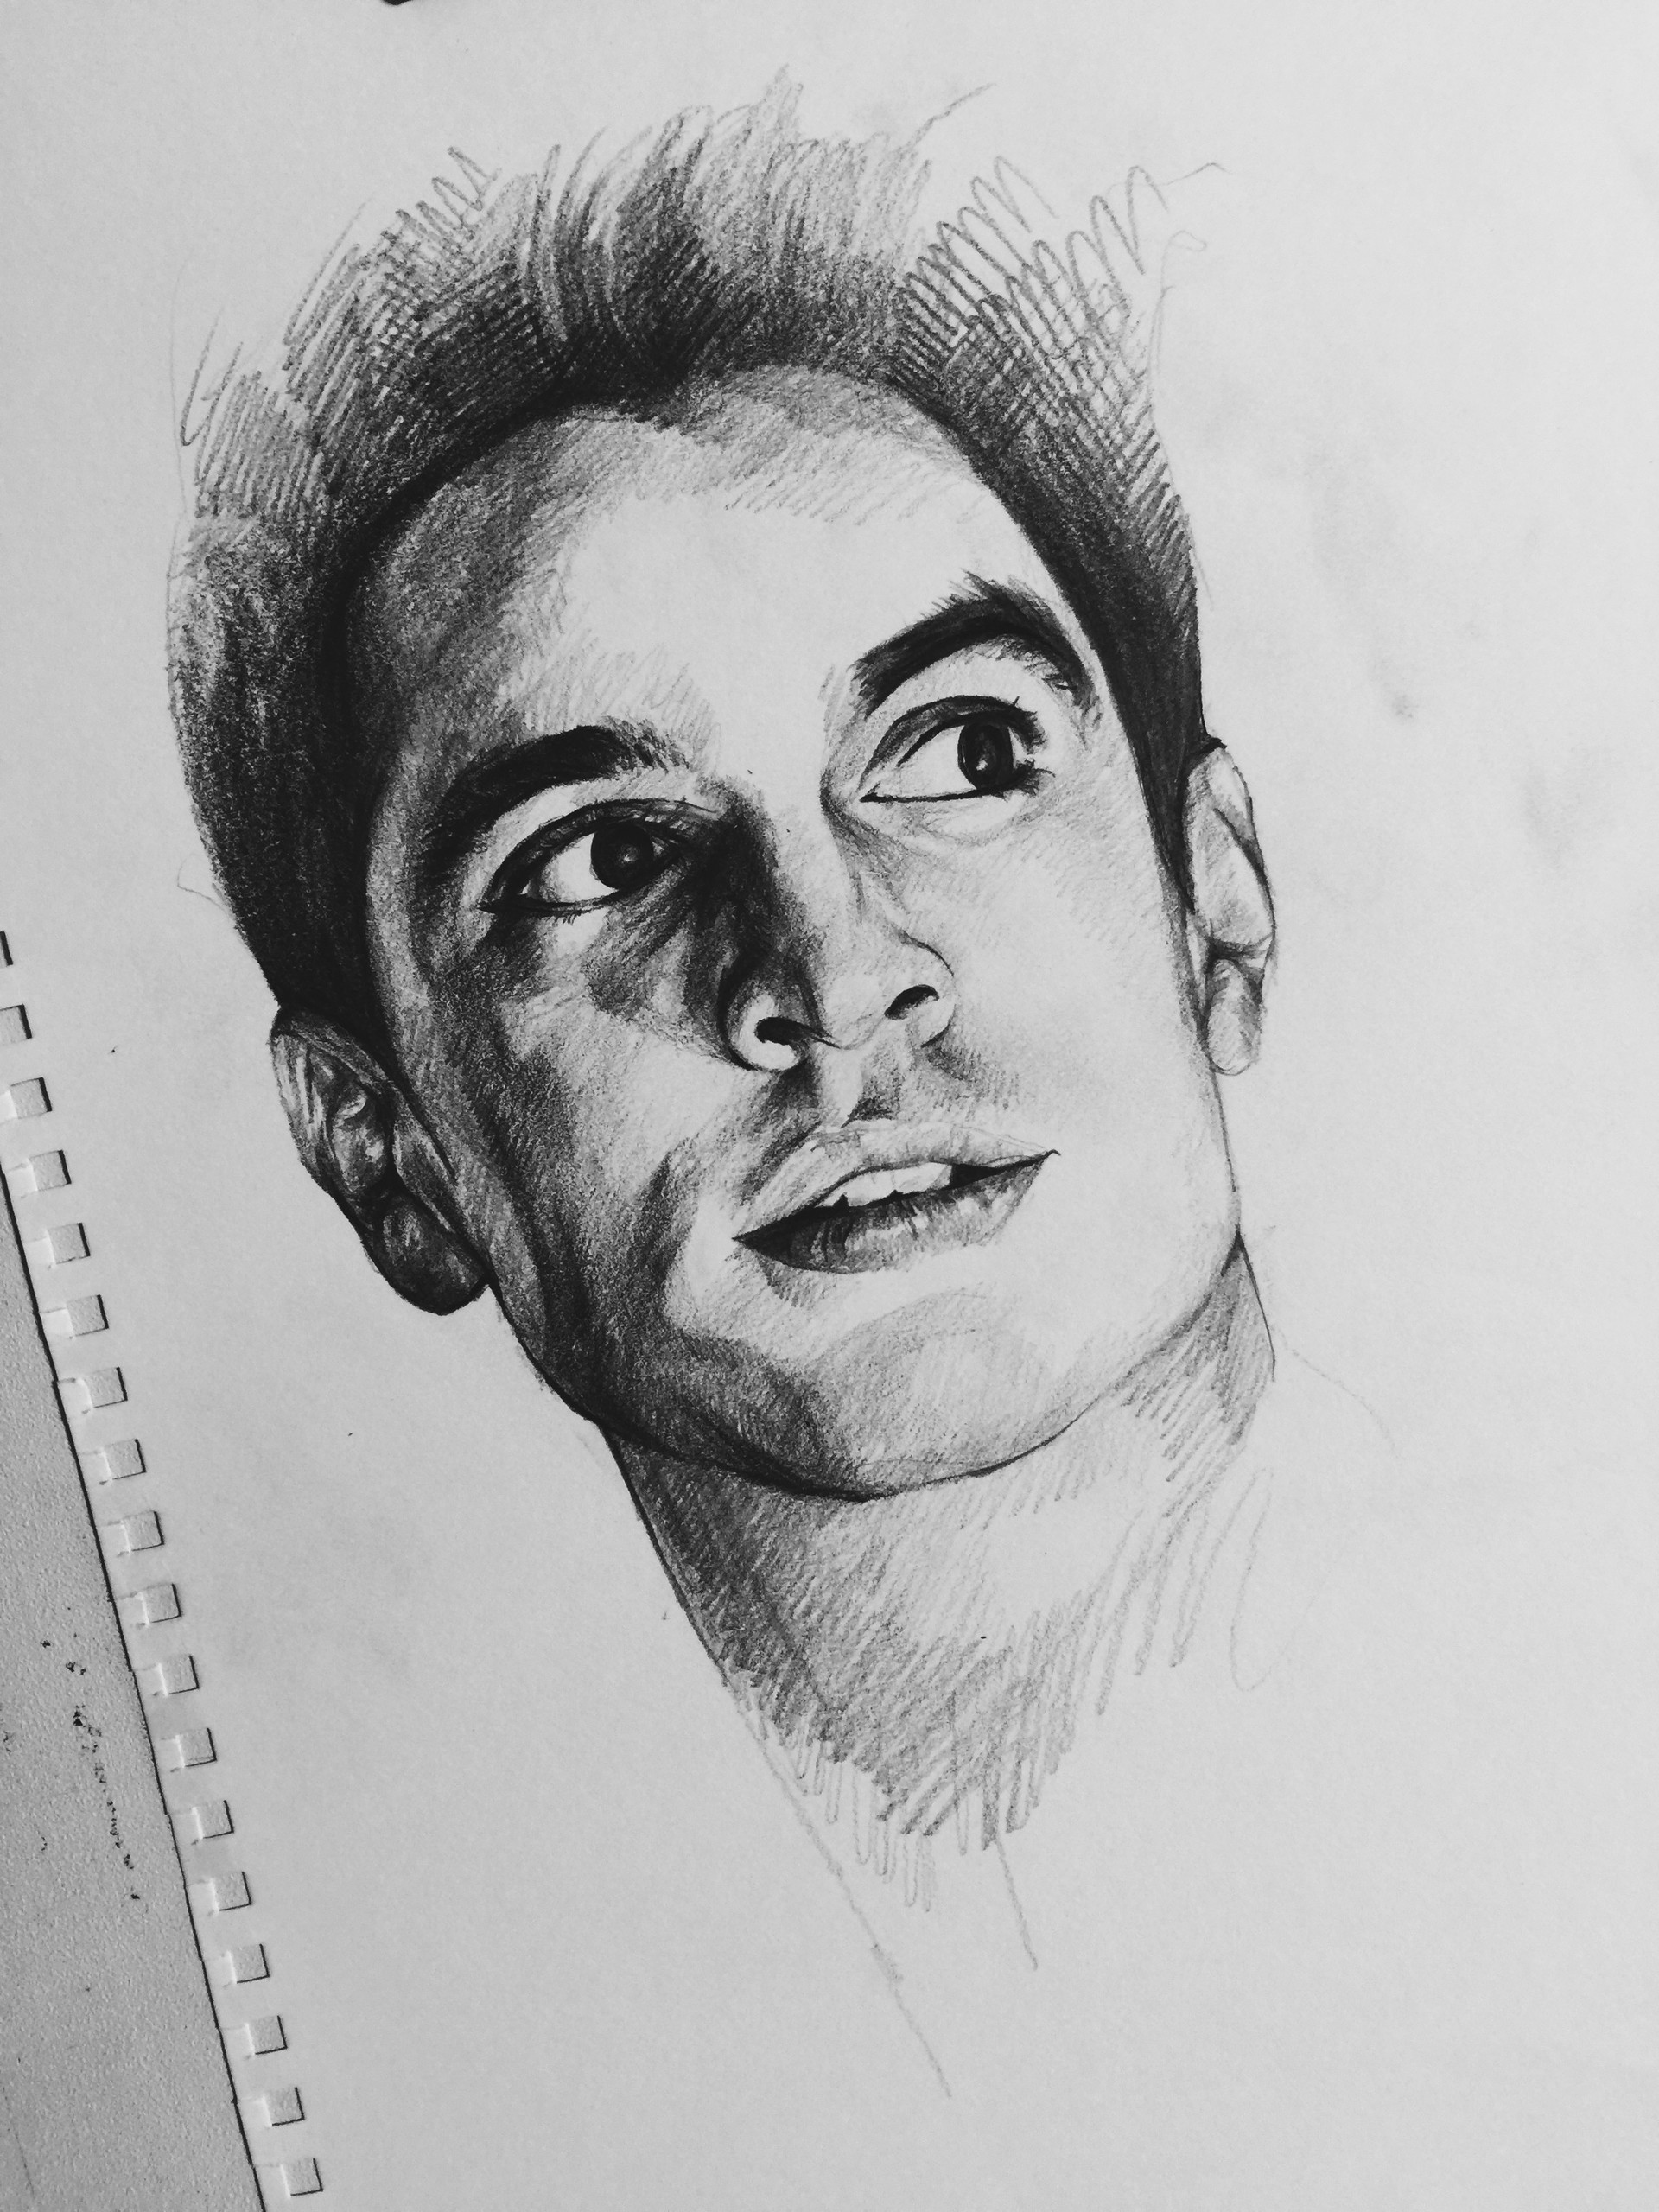 Brendon Urie Drawing : brendon, drawing, Brendon